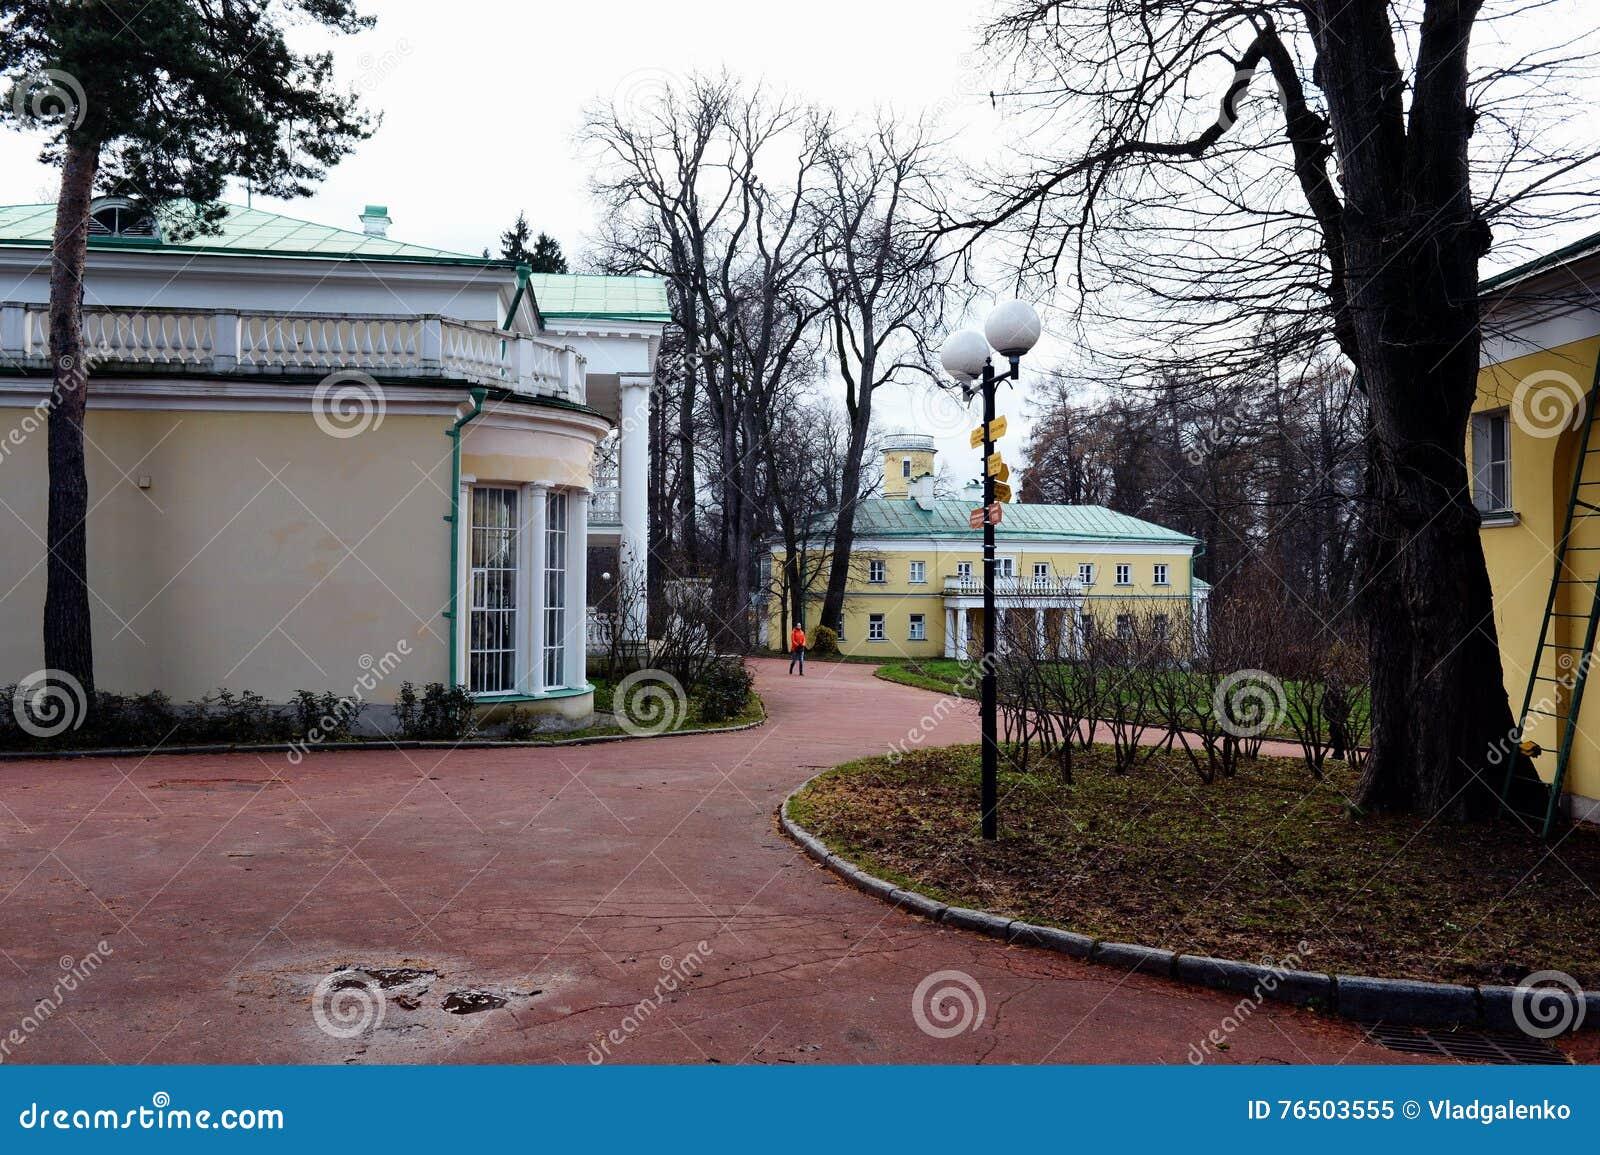 State Museum-Reserve Gorki Leninskie: photos, address, reviews 51